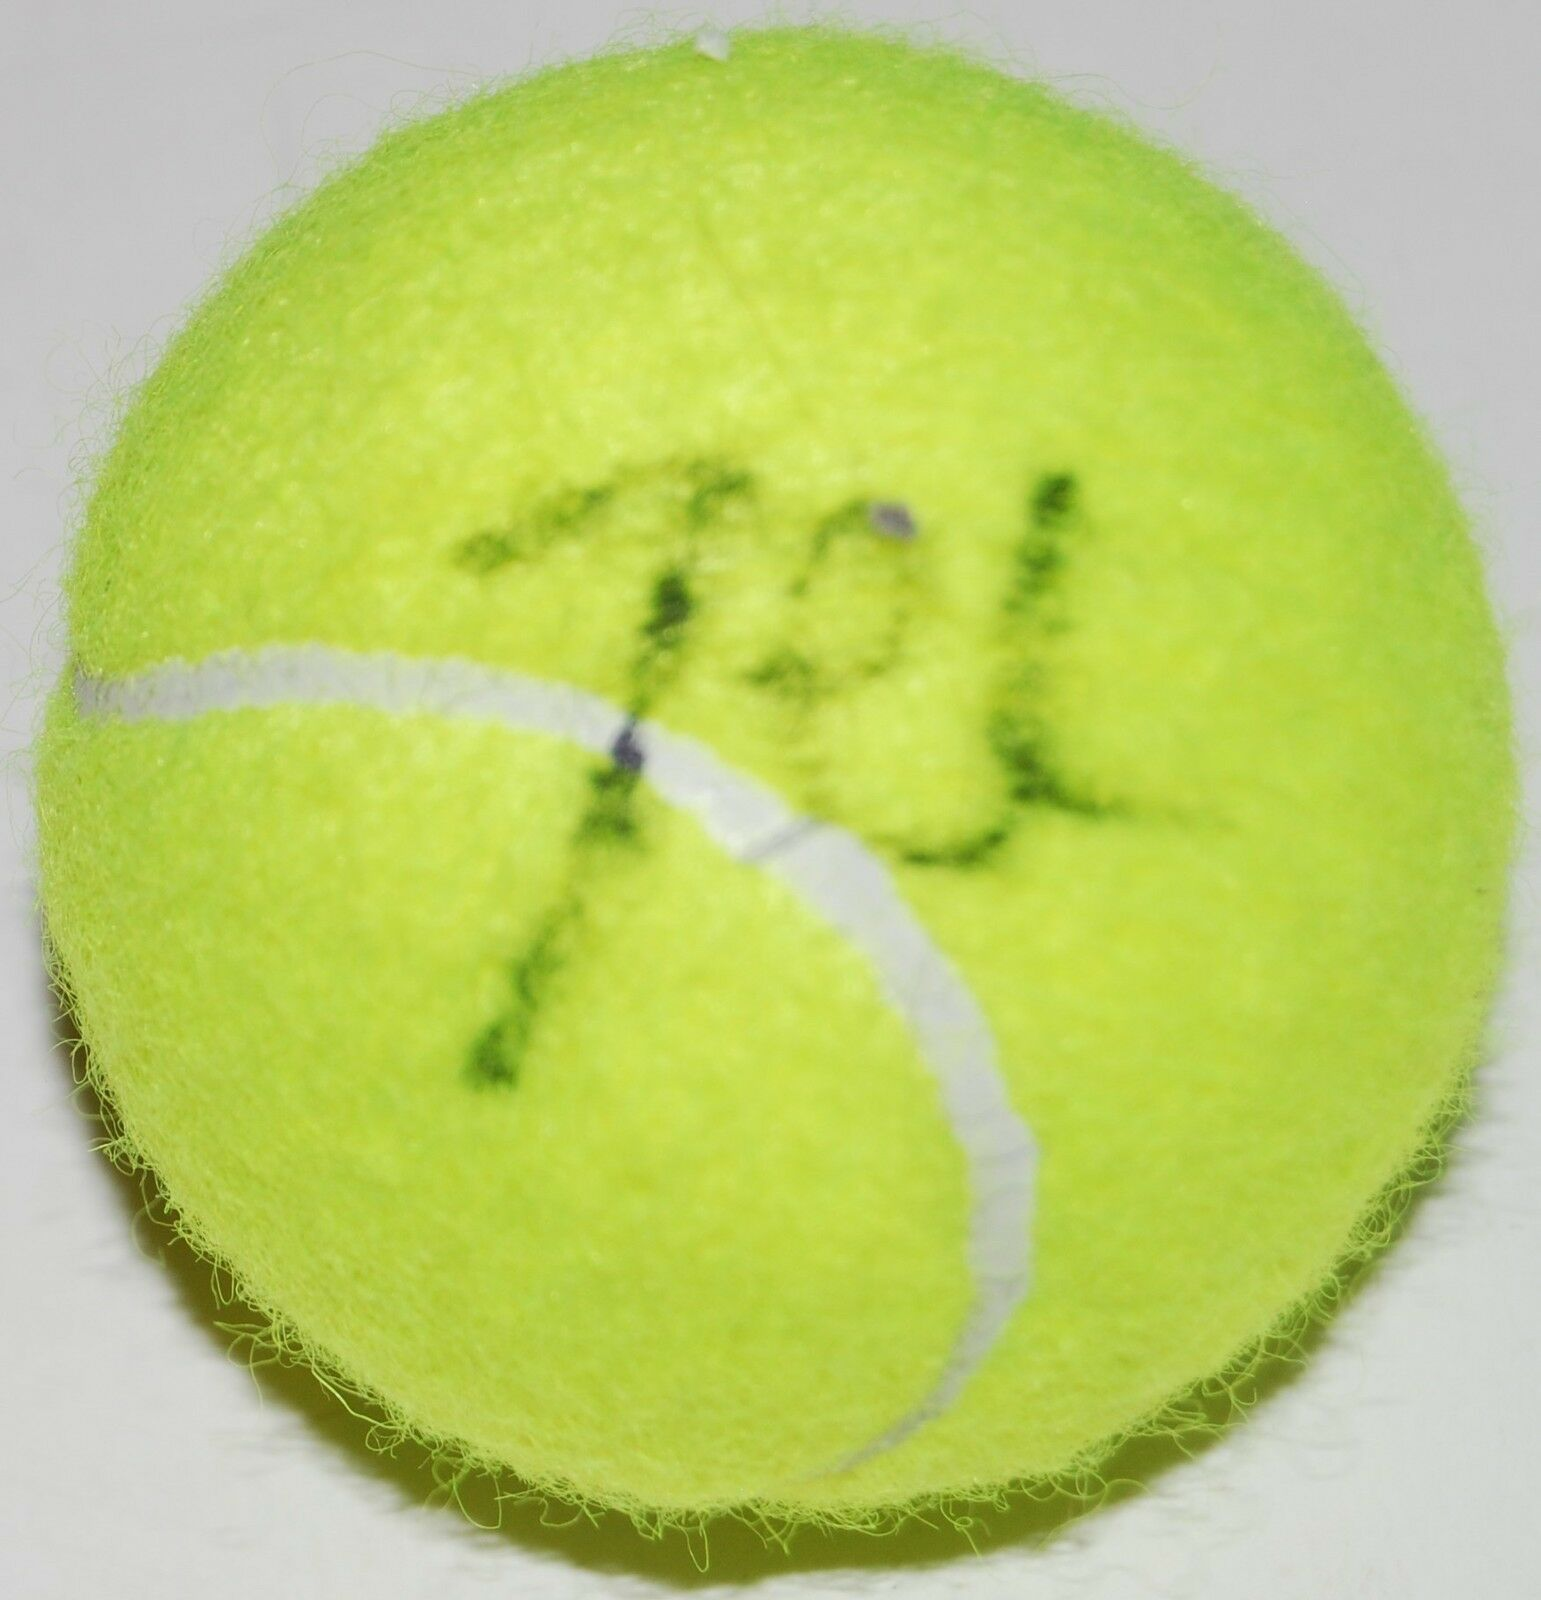 Thomas Enqvist Firmado (Tenis) Bola Wimbledon Lavar Copa Autografiado con   Coa